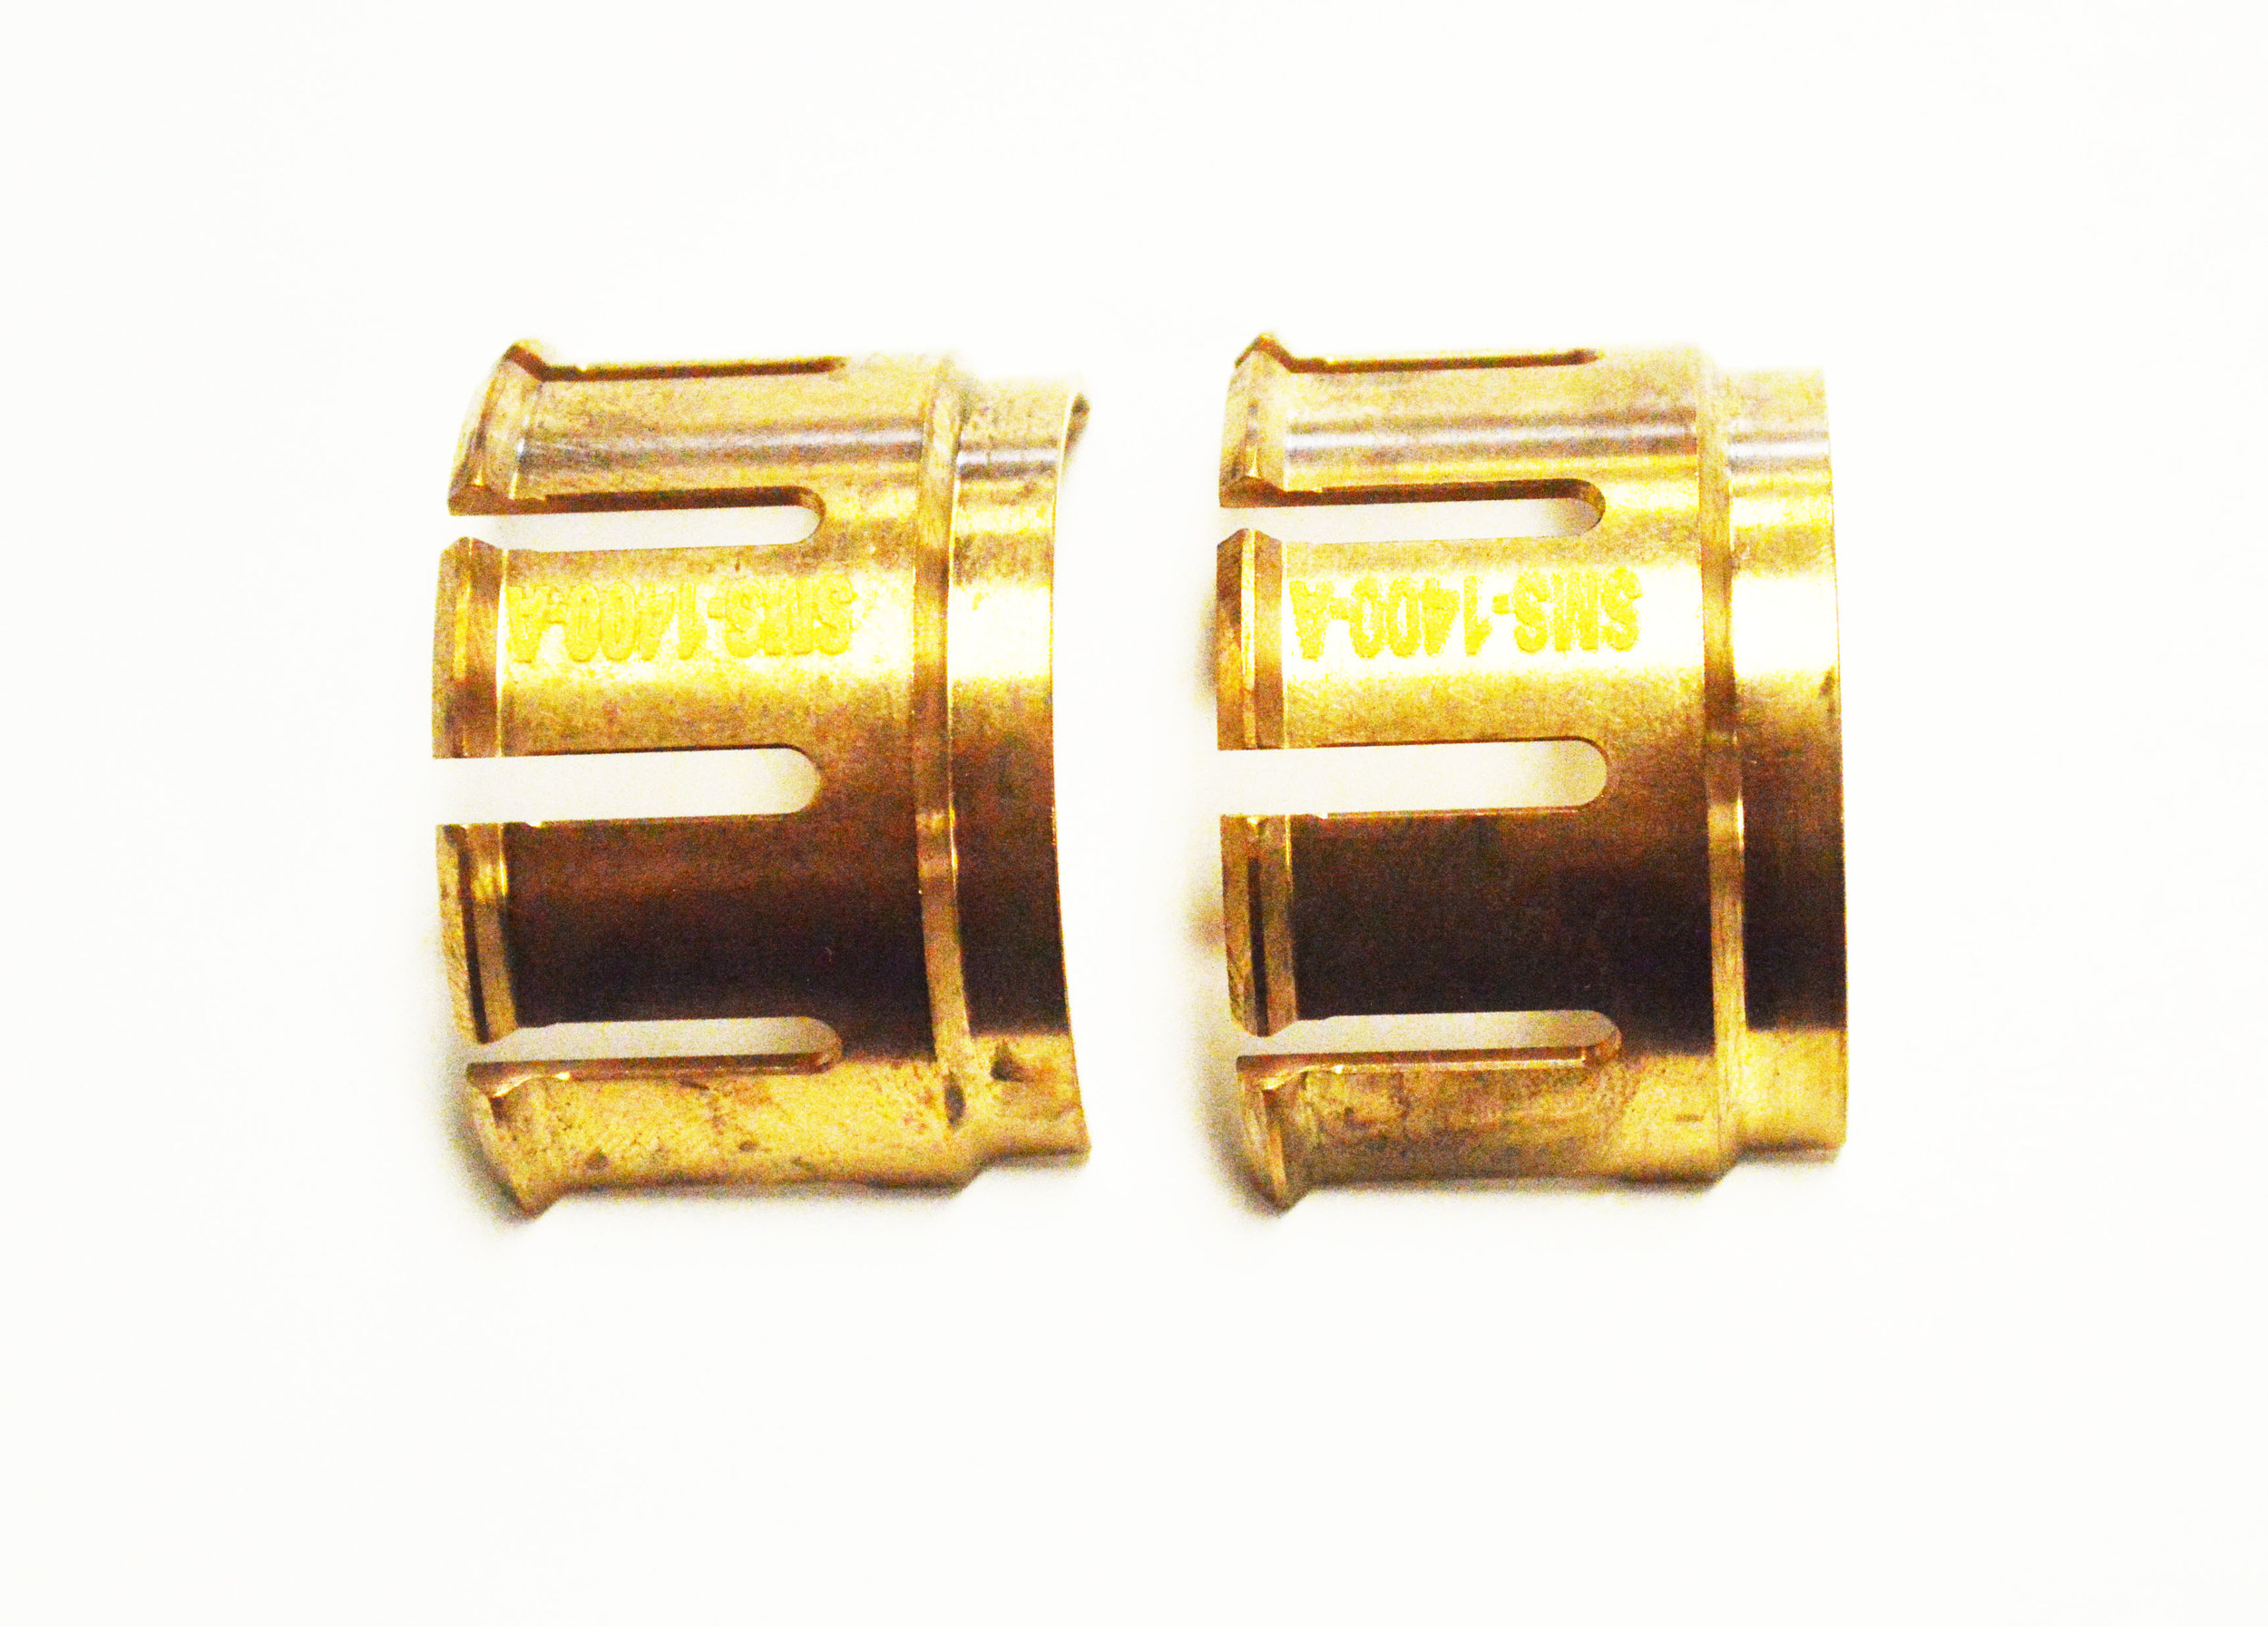 Helix Split Locking Rings              BeCu           SMS-1400